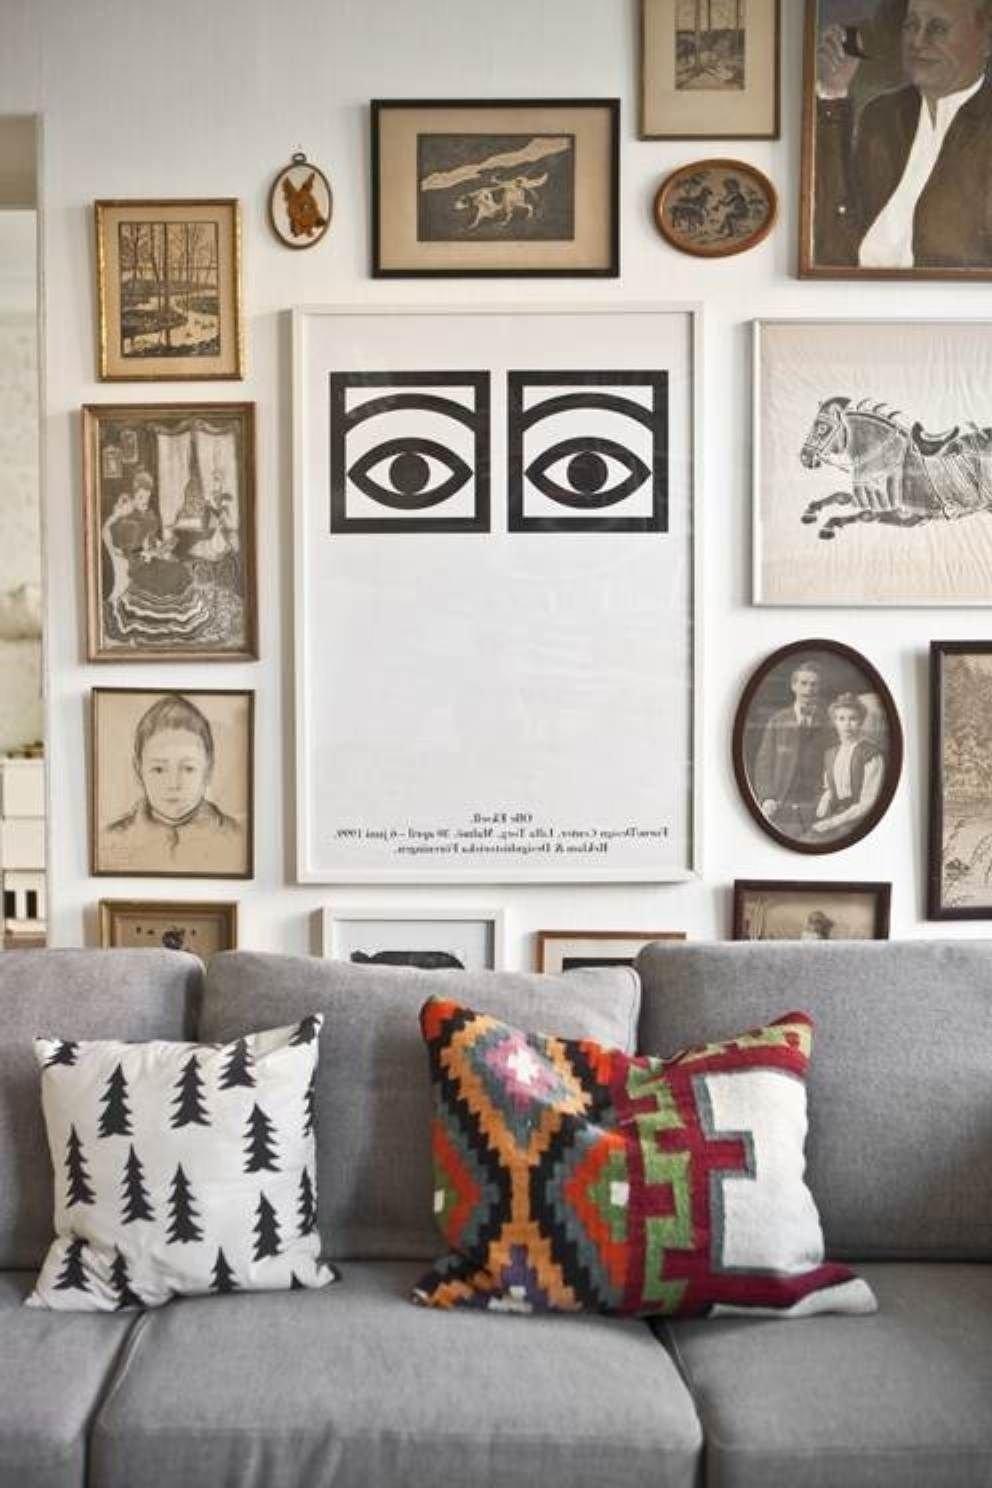 10 Most Popular Wall Art Ideas For Living Room wonderful wall art ideas for living room for the home pinterest 2020